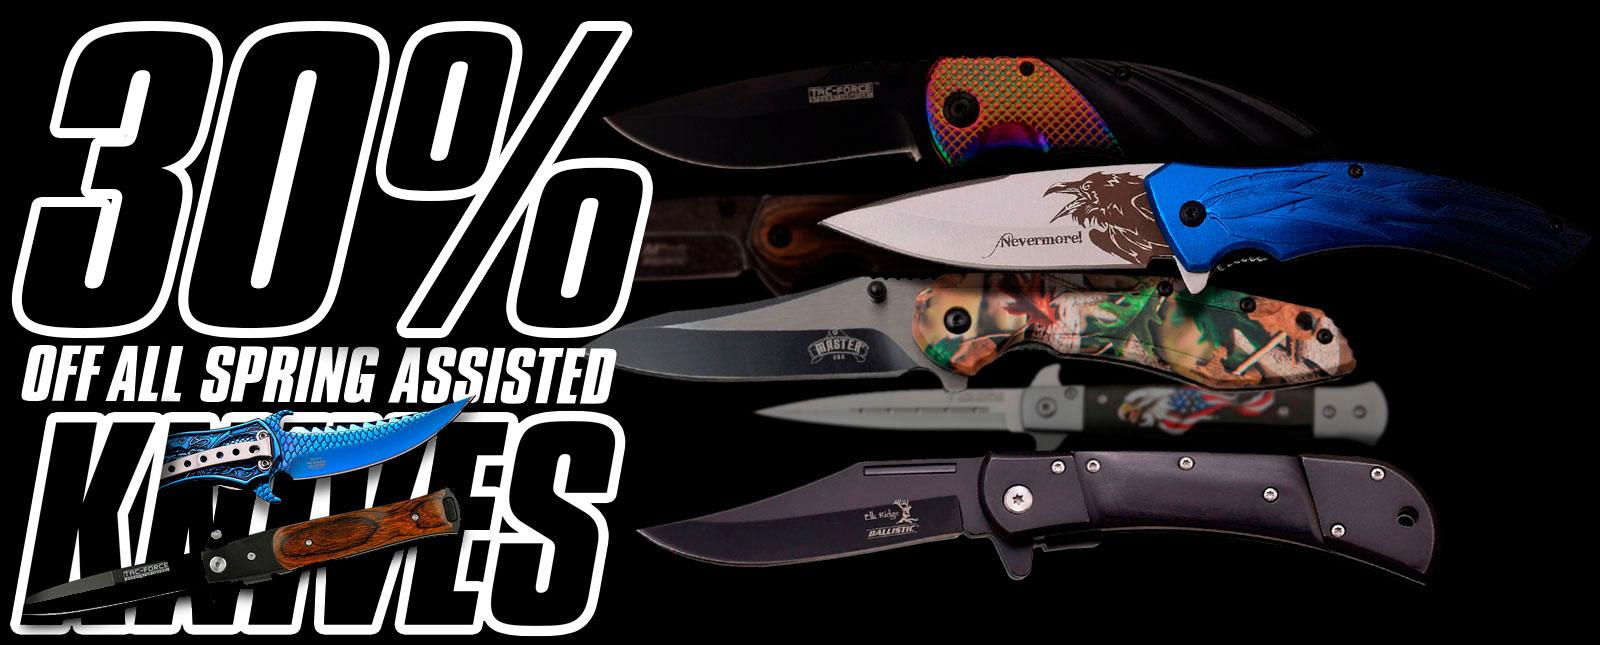 spring assisted knife sale